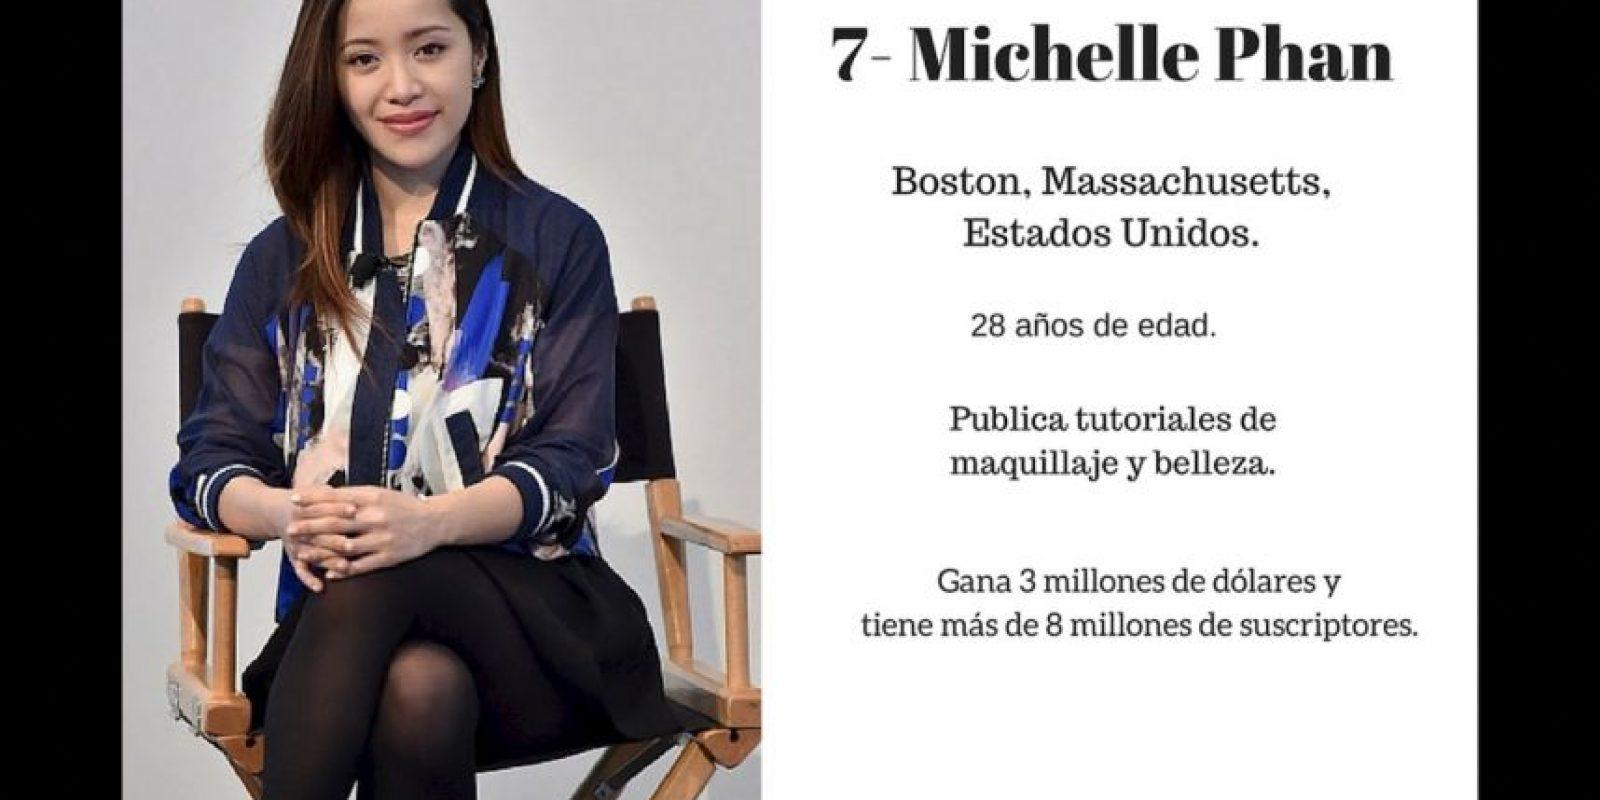 7- Michelle Phan: 3 millones de dólares. Foto:Especial / Getty Images